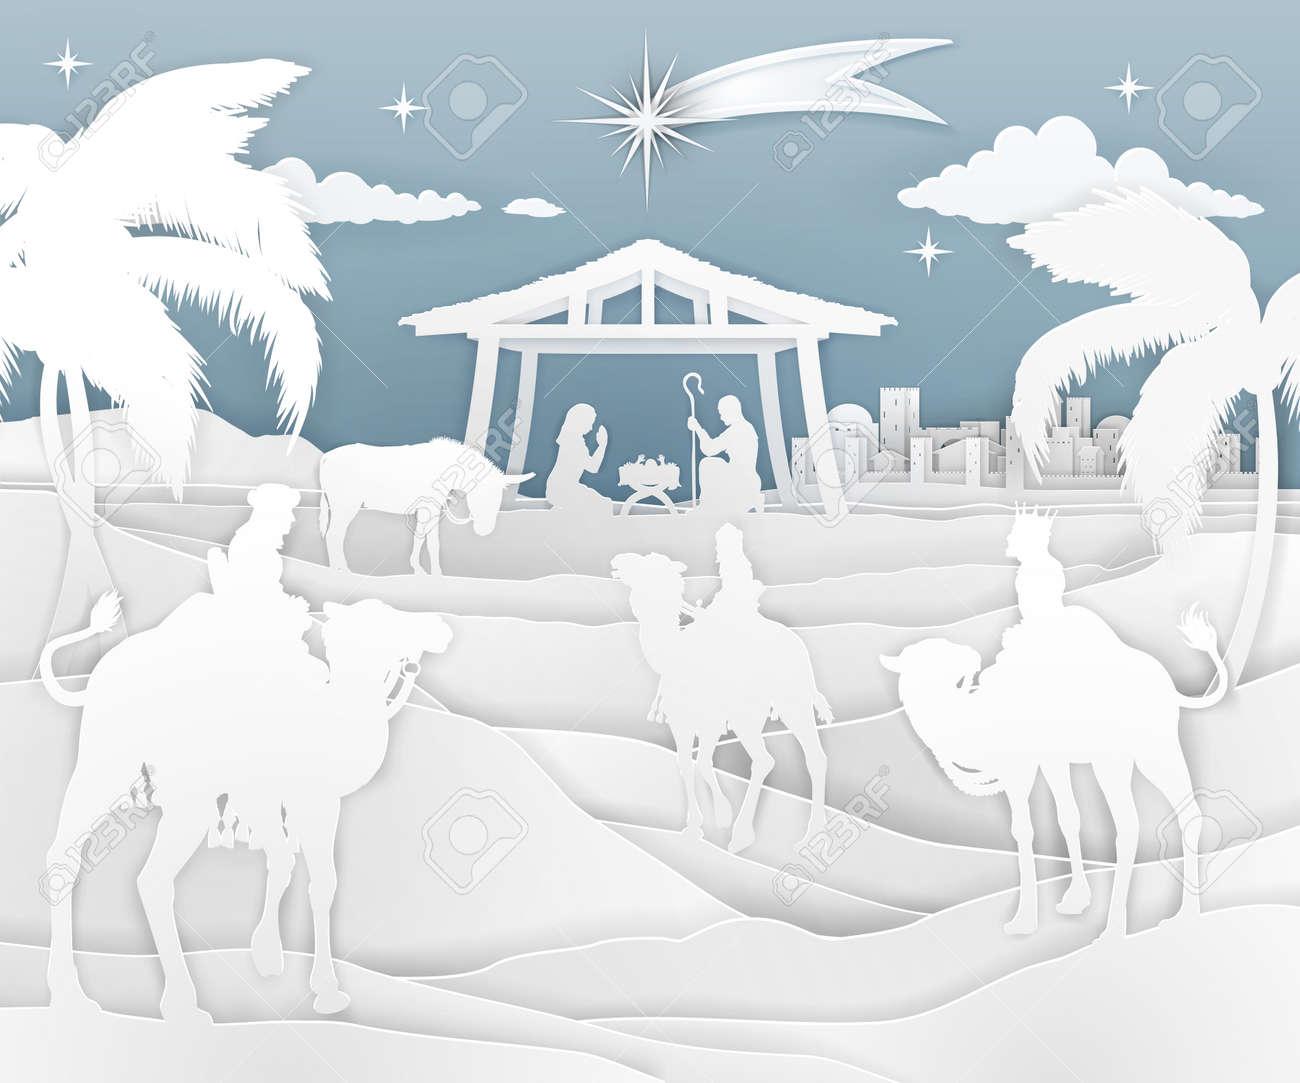 Nativity Christmas Scene Paper Style - 109221284